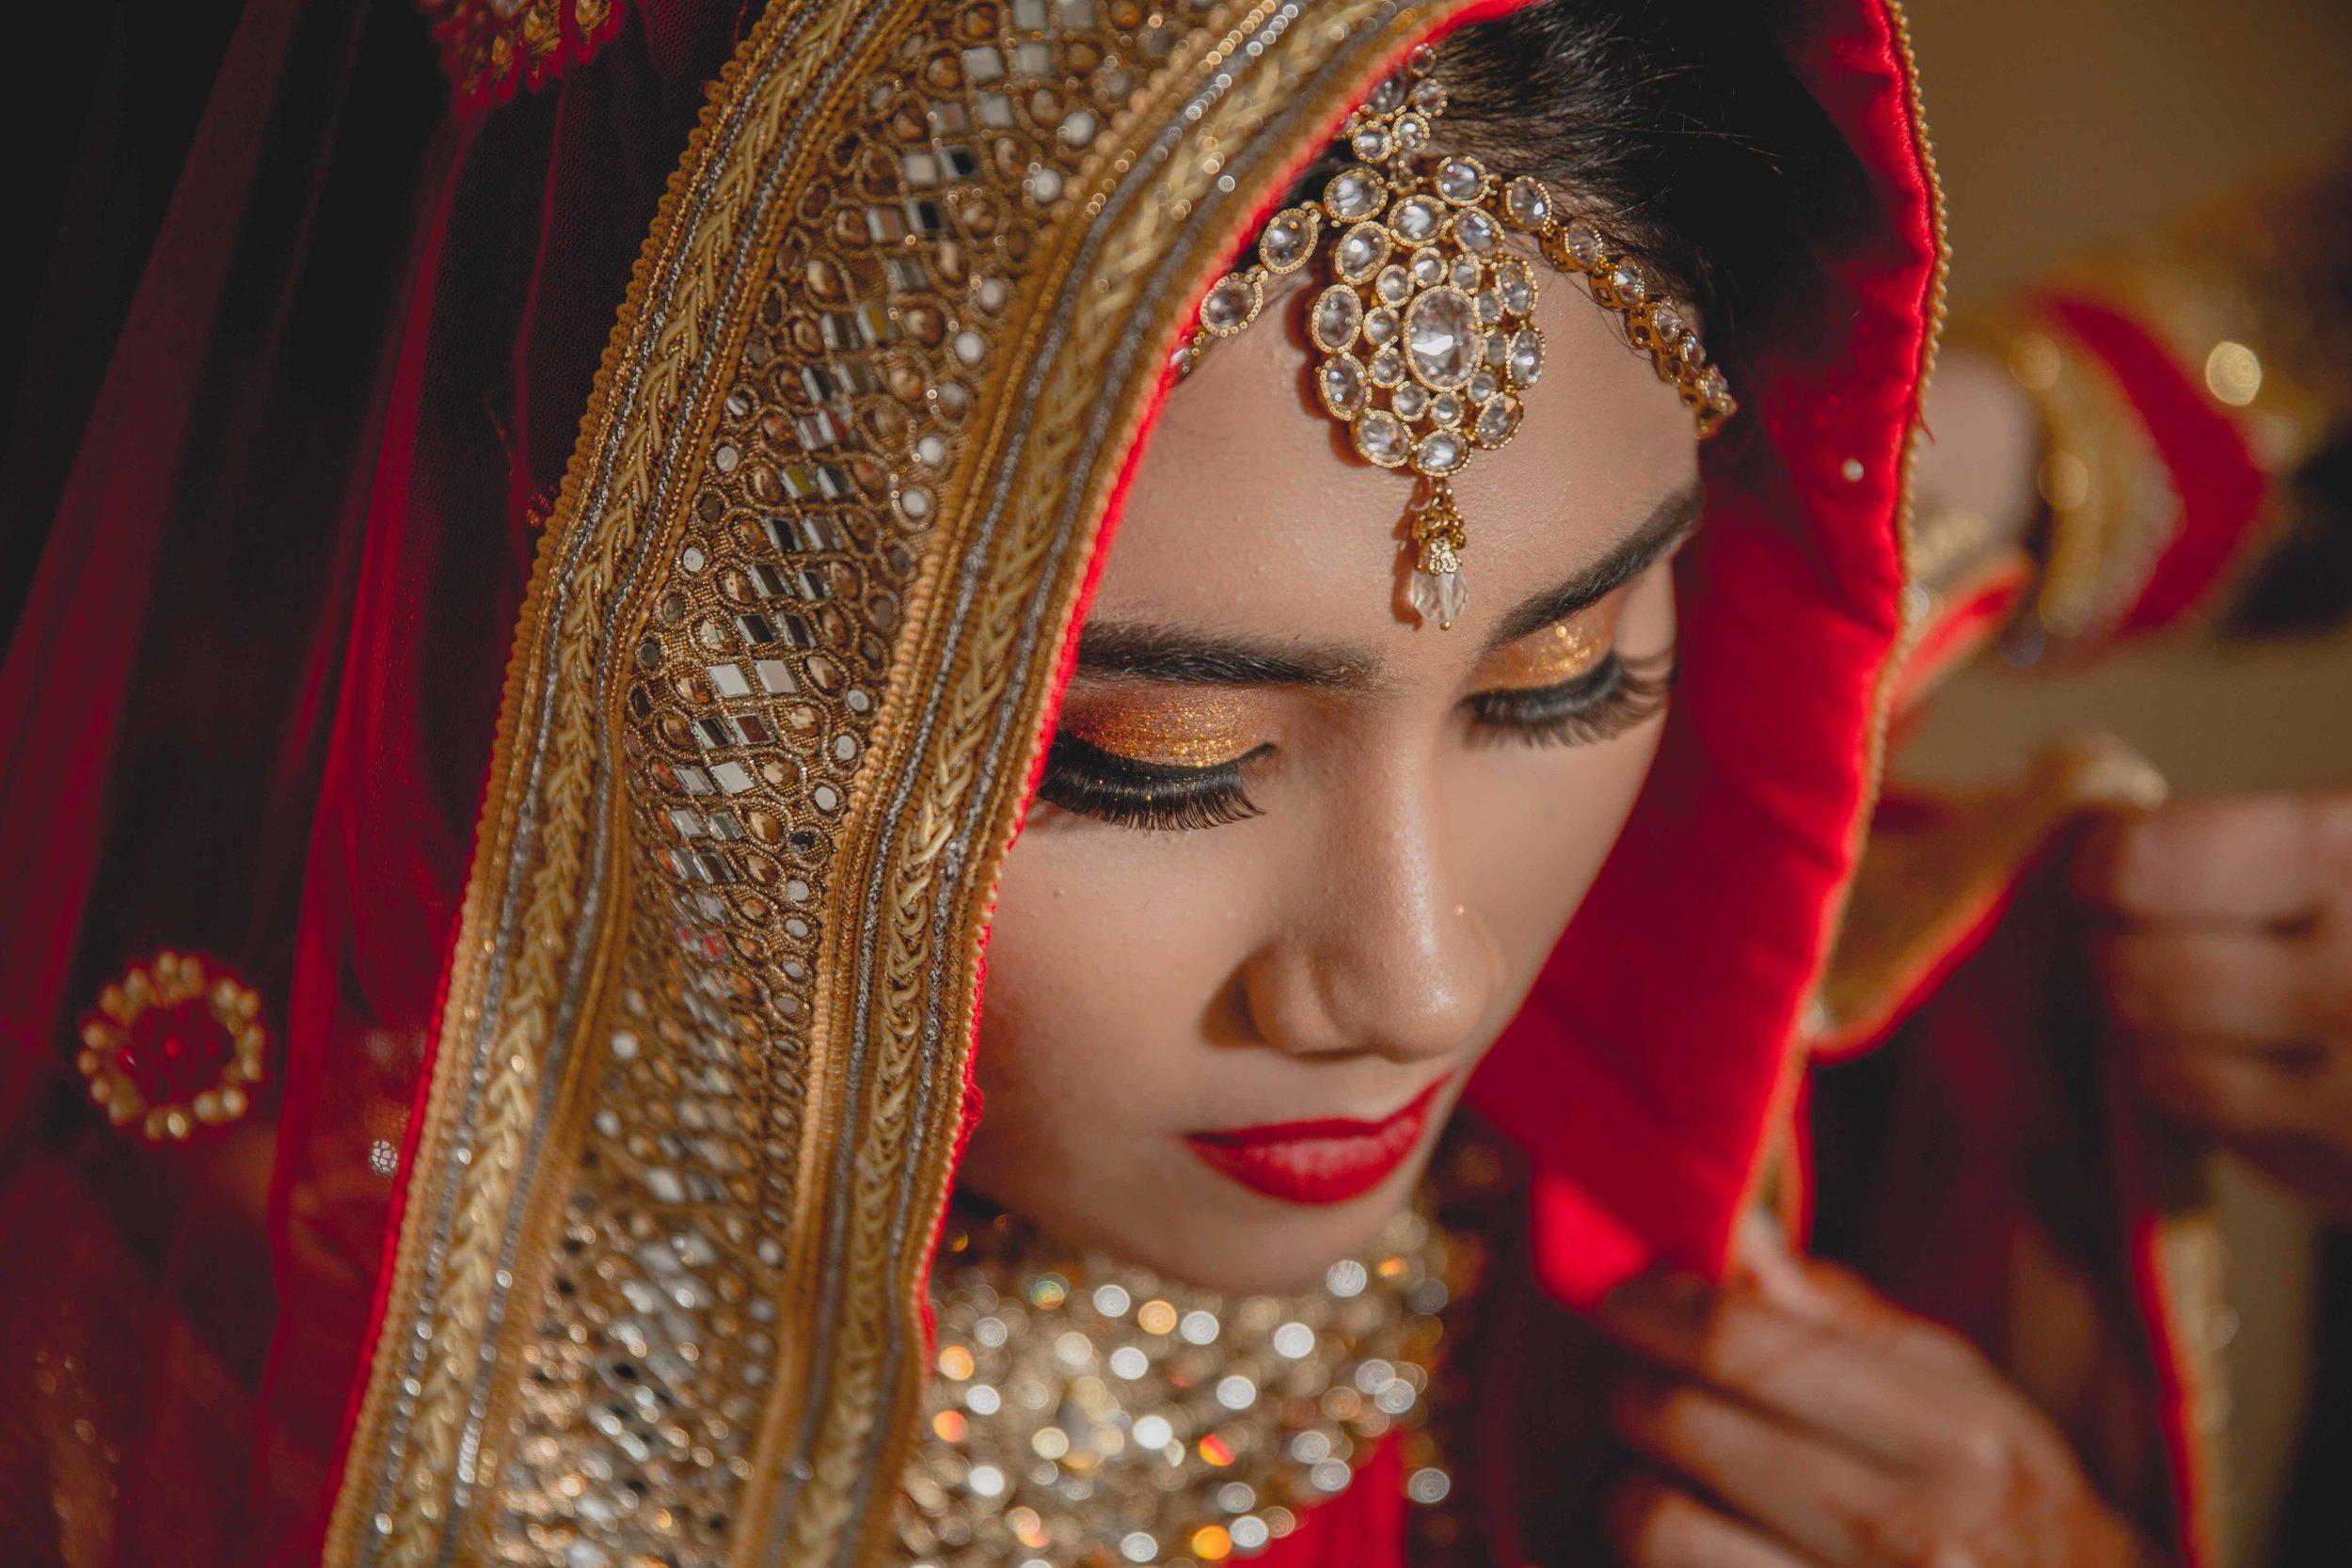 Female-wedding-photographer-birmingham-muslim-wedding-natalia-smith-photography-6.jpg